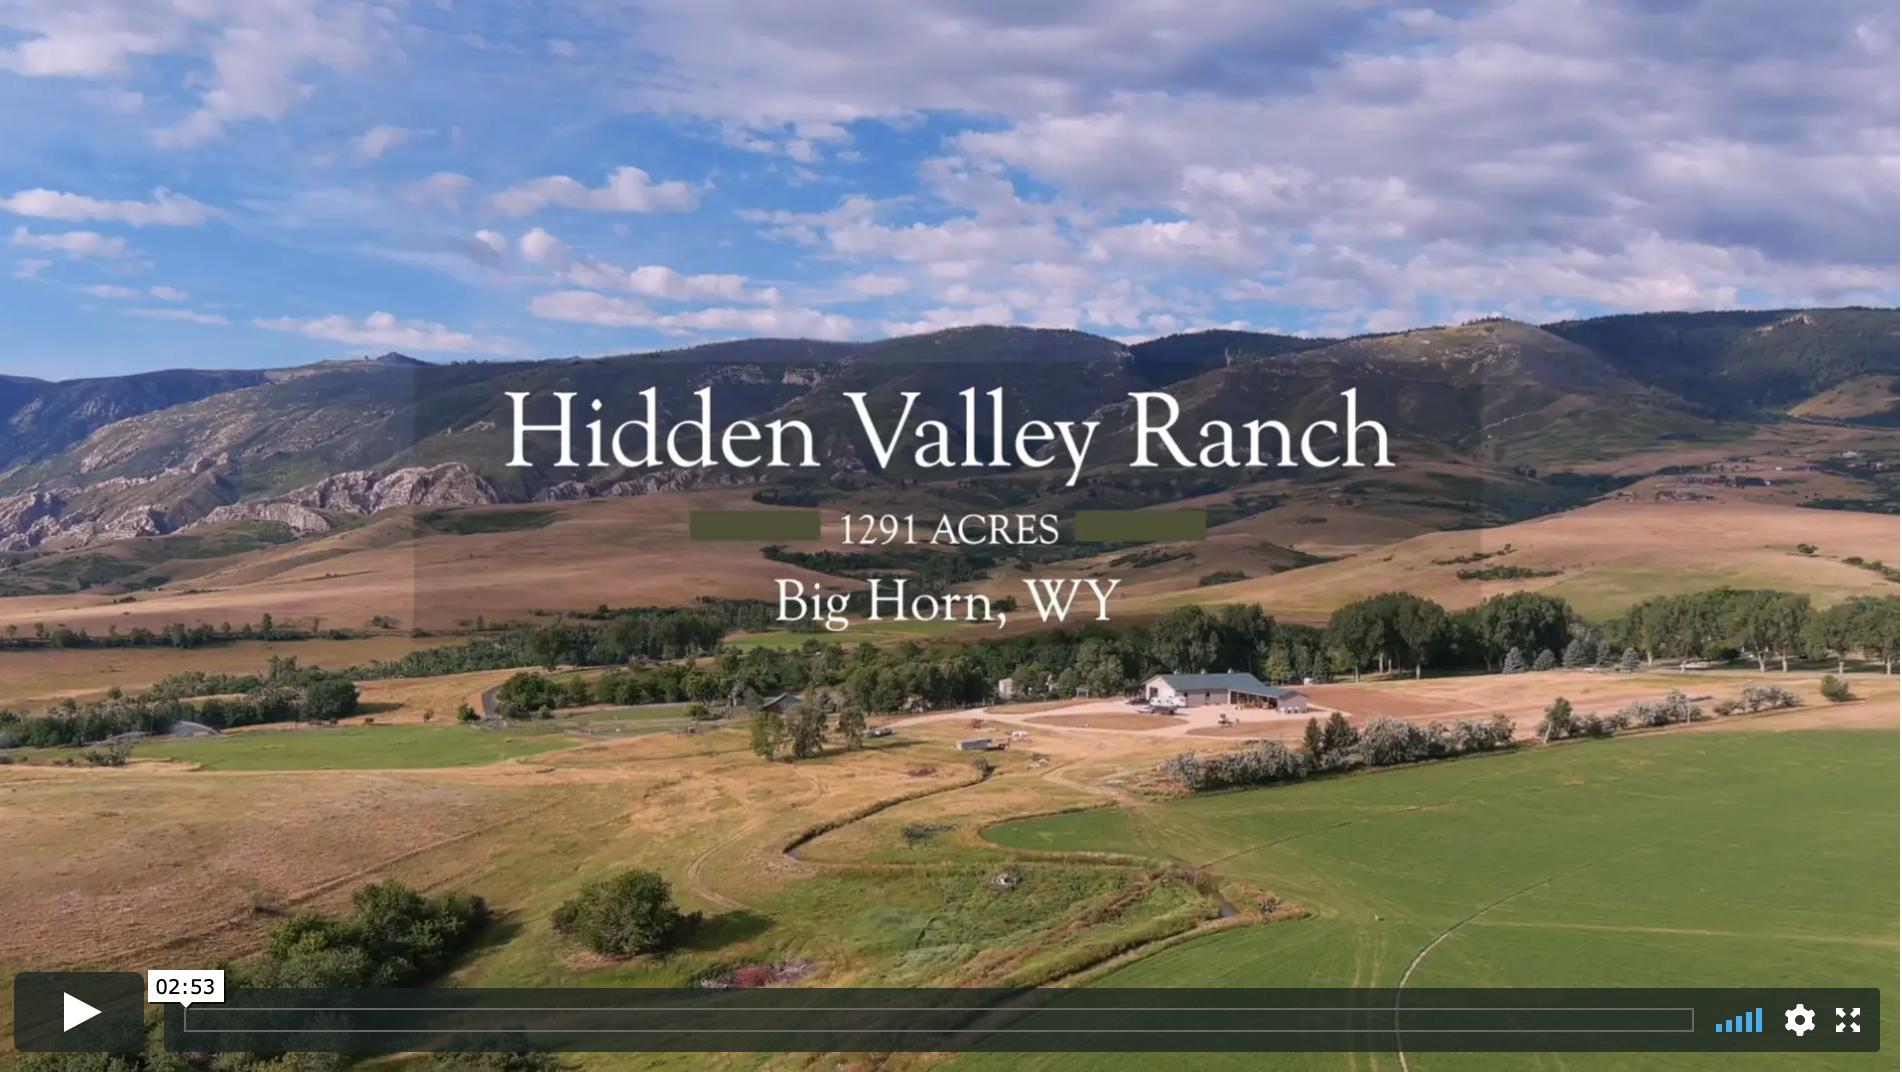 Link to Vimeo